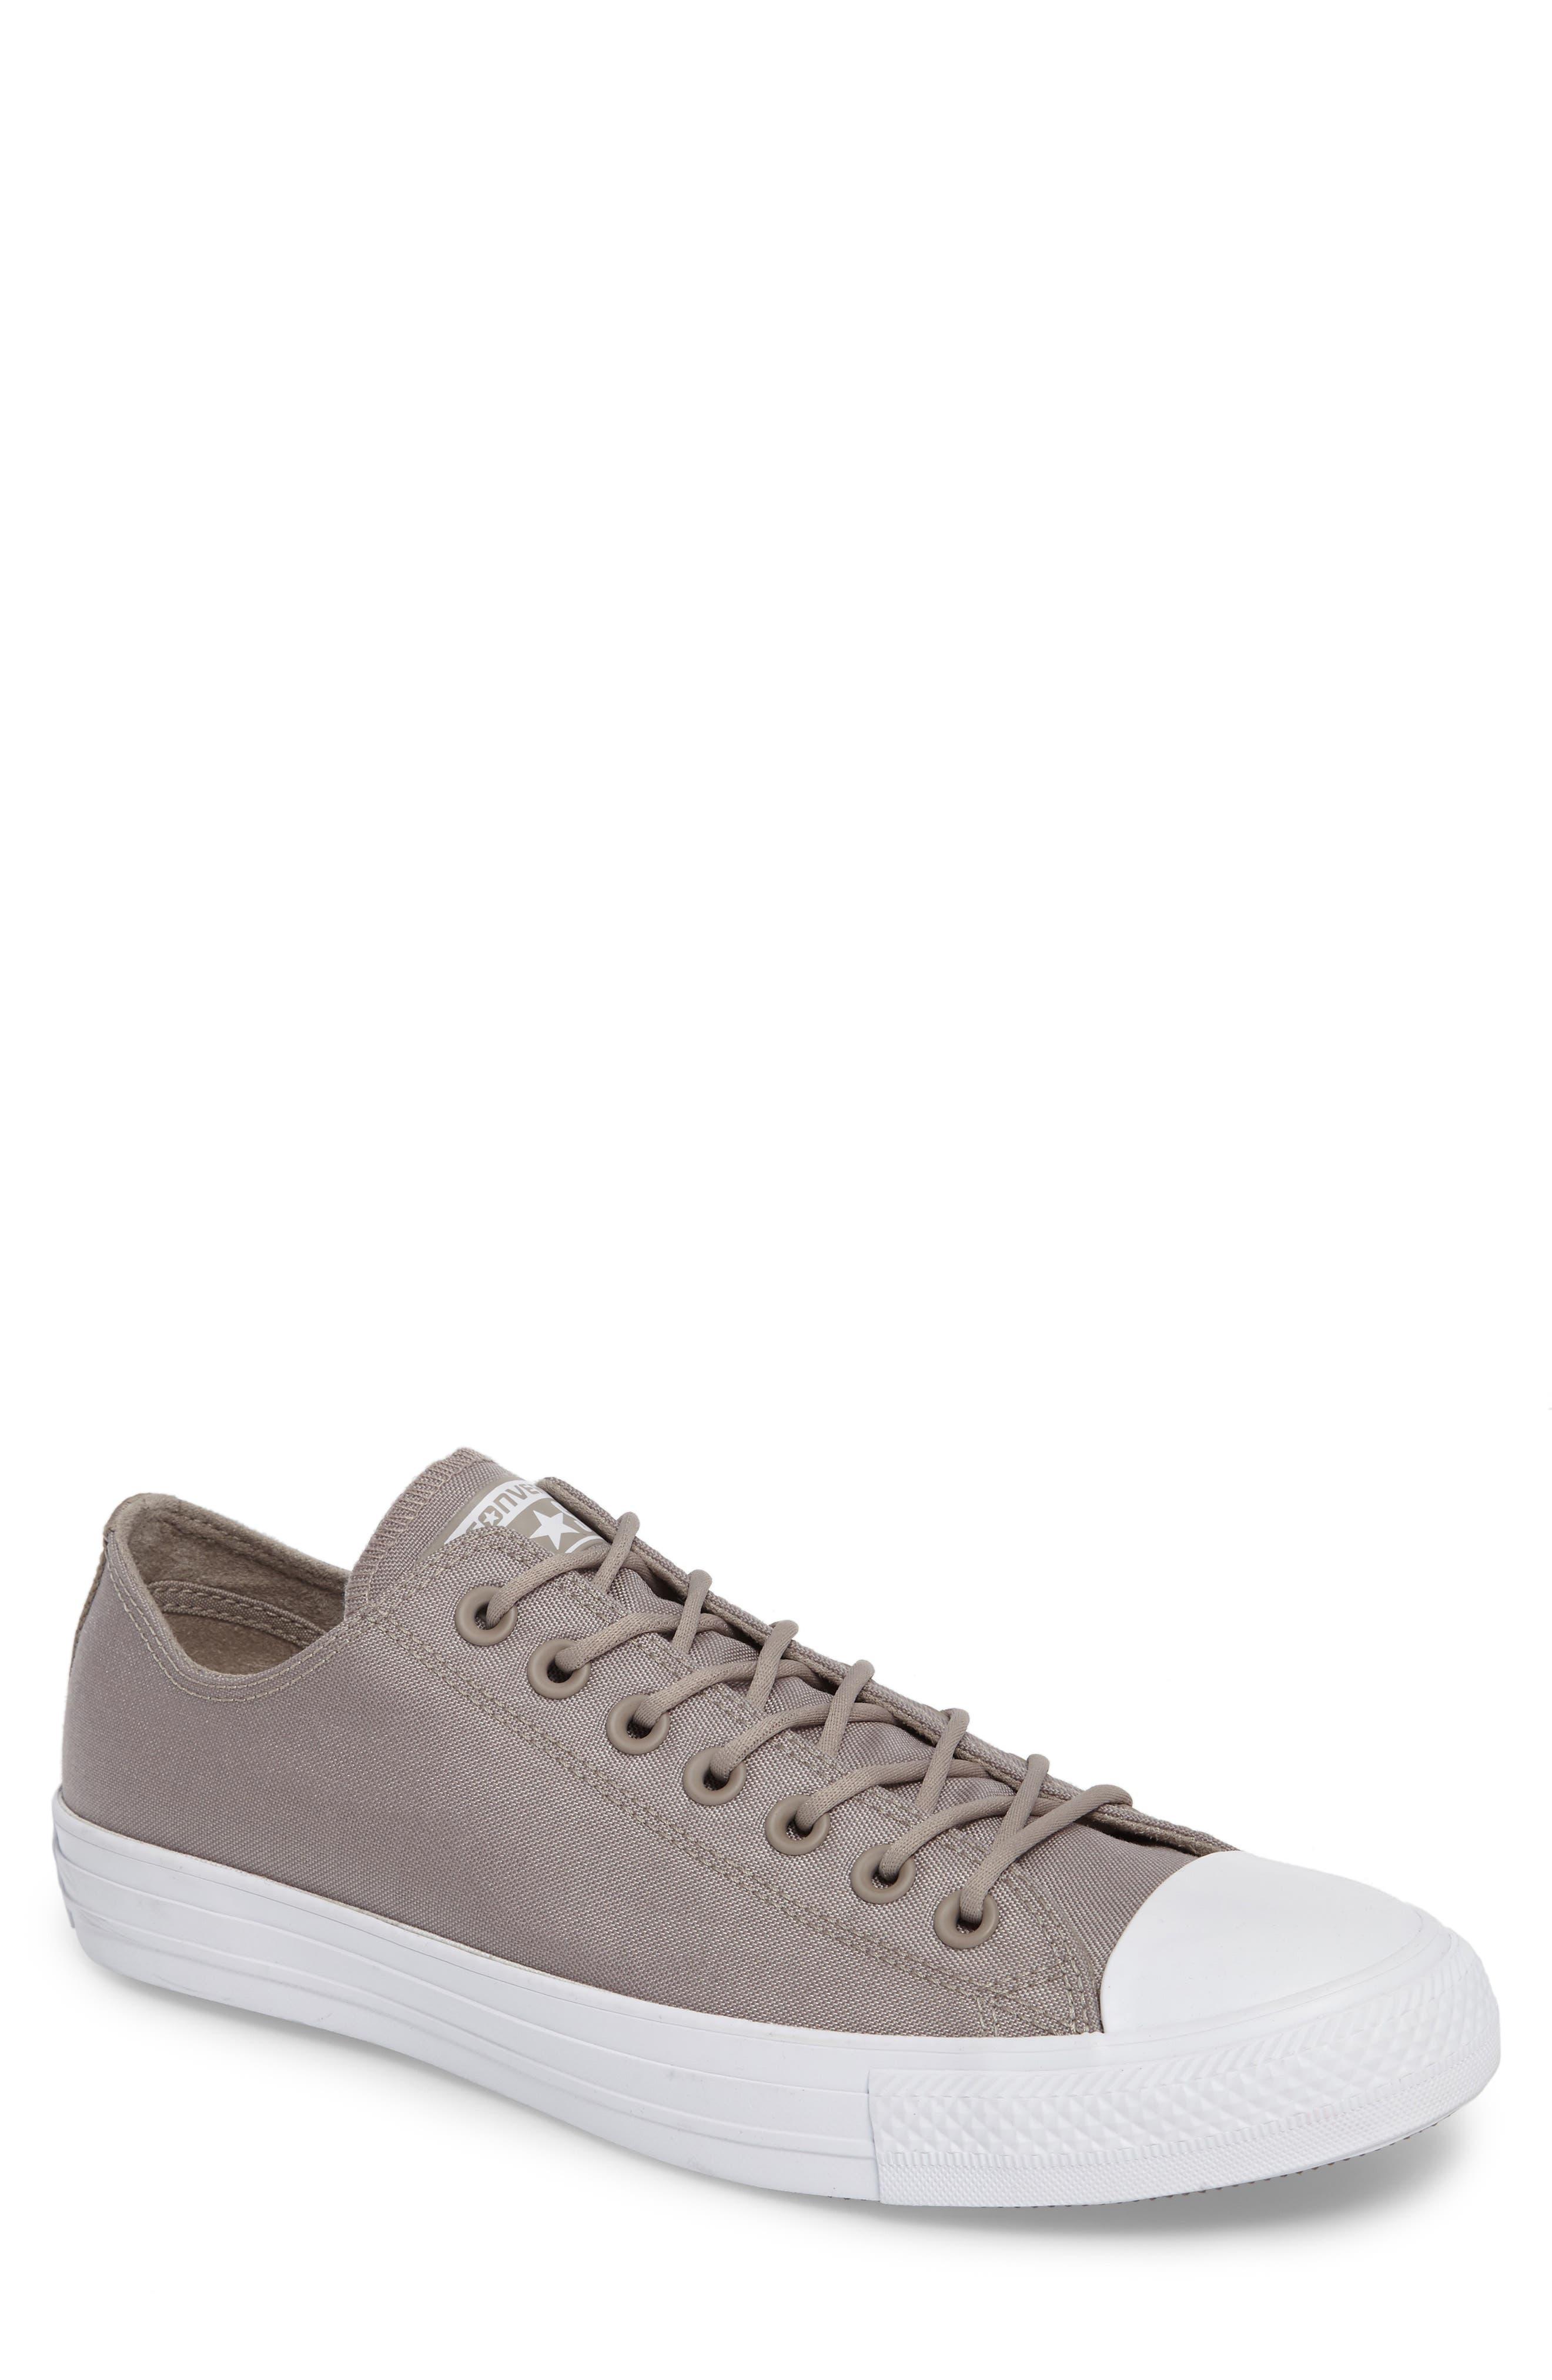 Converse Chuck Taylor® All Star® Ox Sneaker (Men)